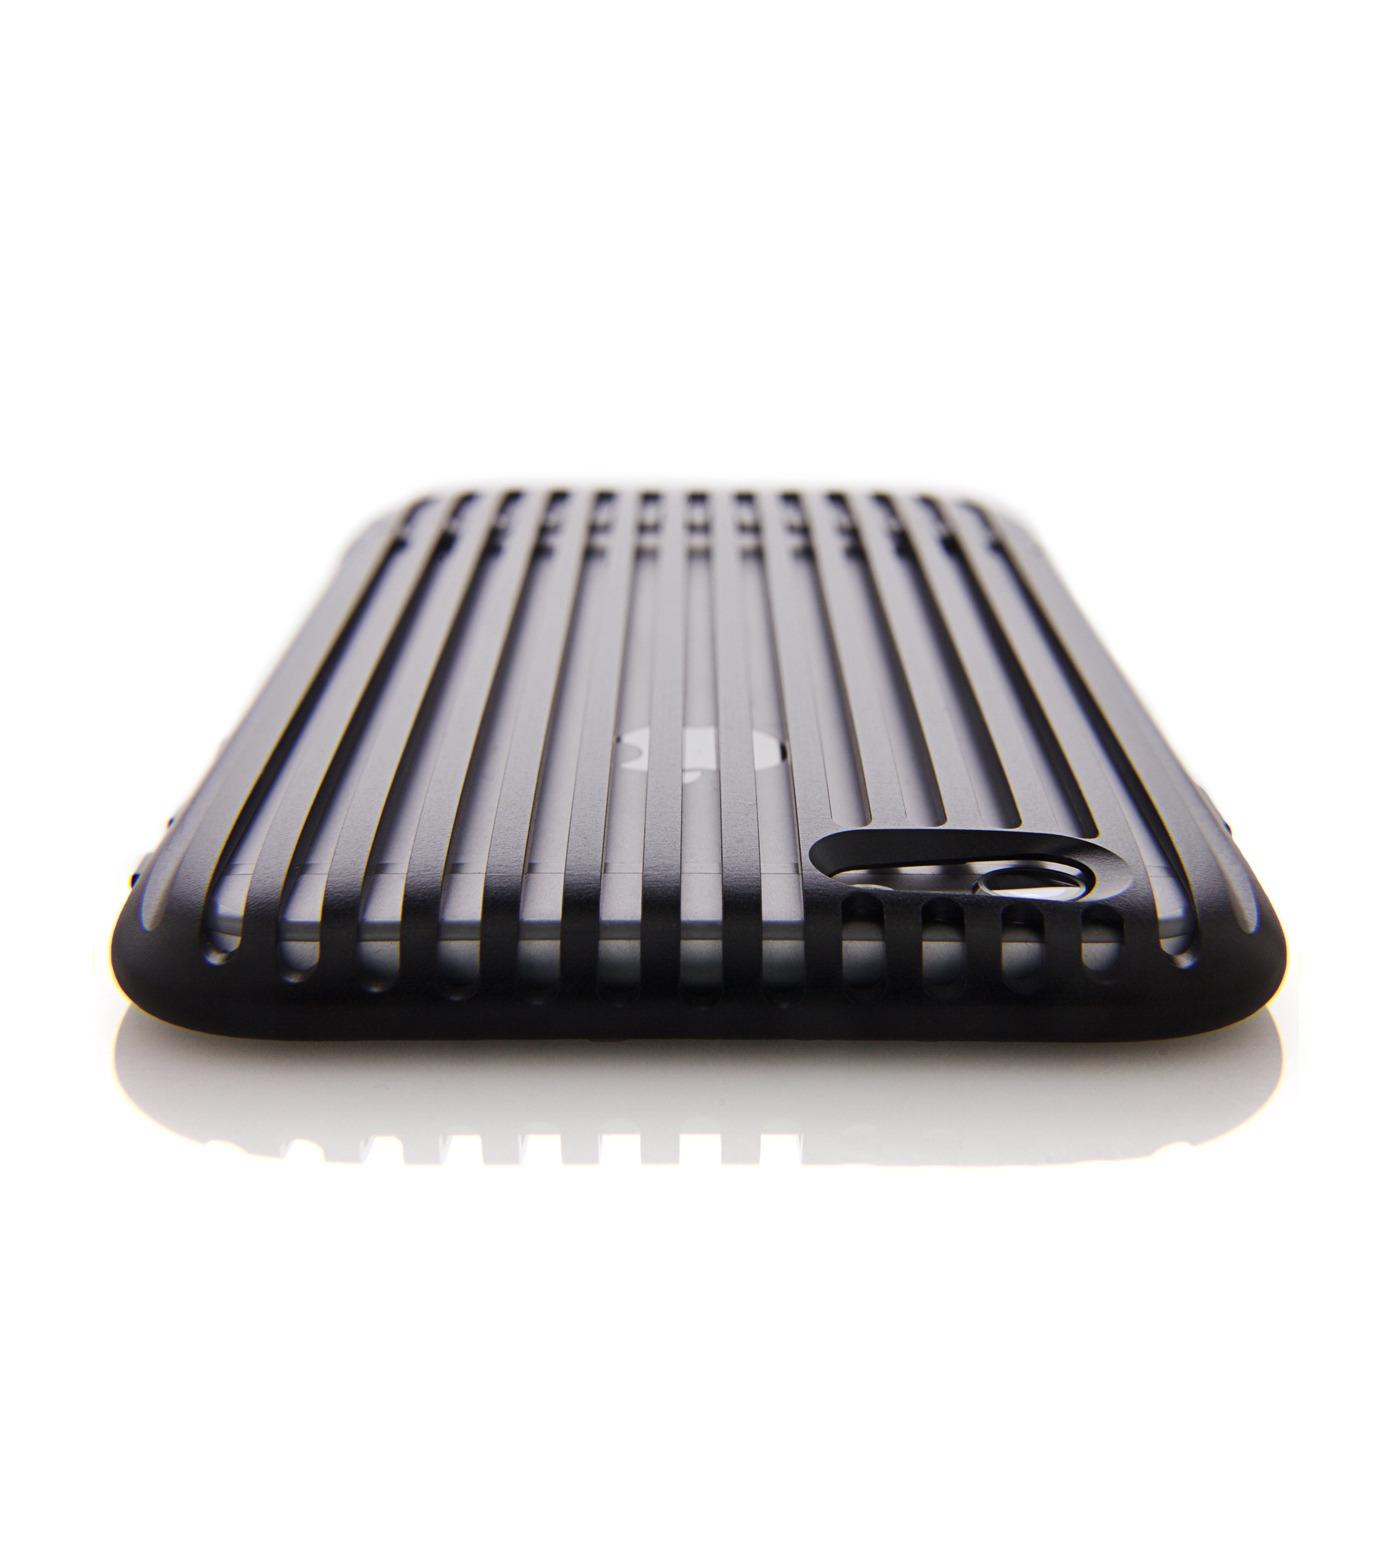 SQUAIR(スクエア)のThe Slit for iPhone6-BLACK(ケースiphone6/6s/case iphone6/6s)-SQSLT620-BLK-13 拡大詳細画像1